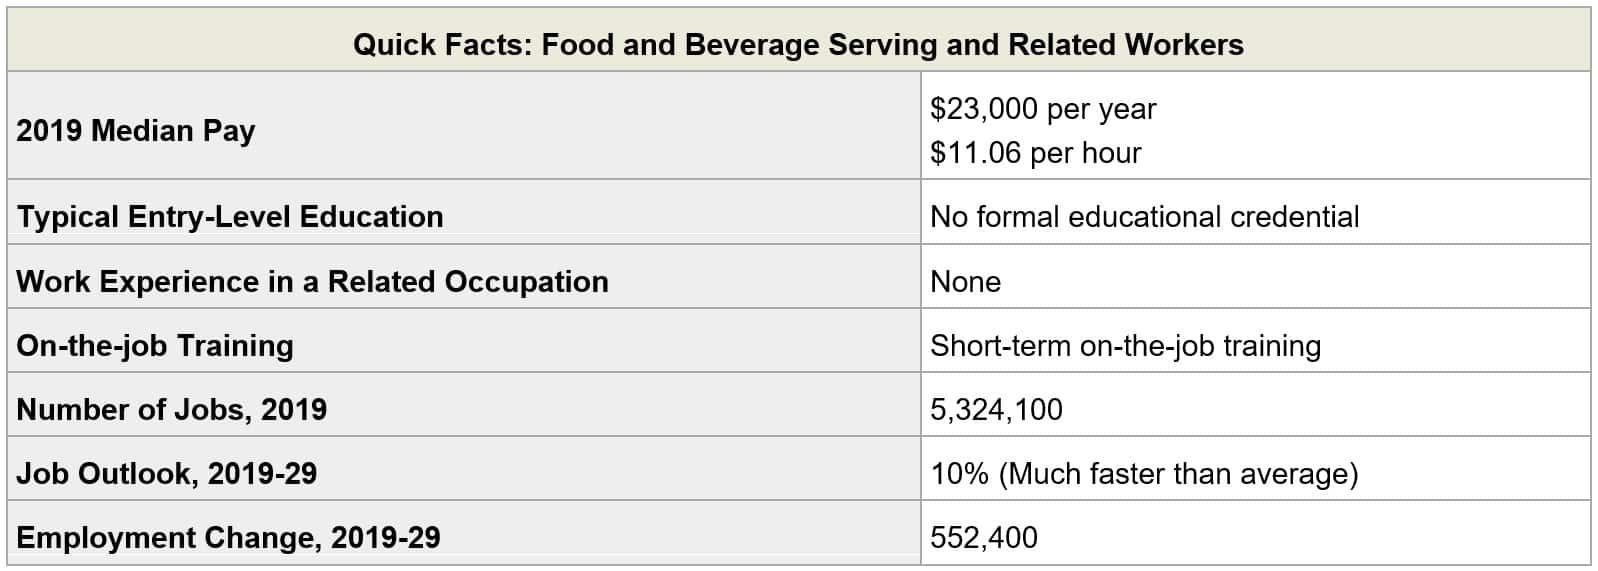 brewery business employment data